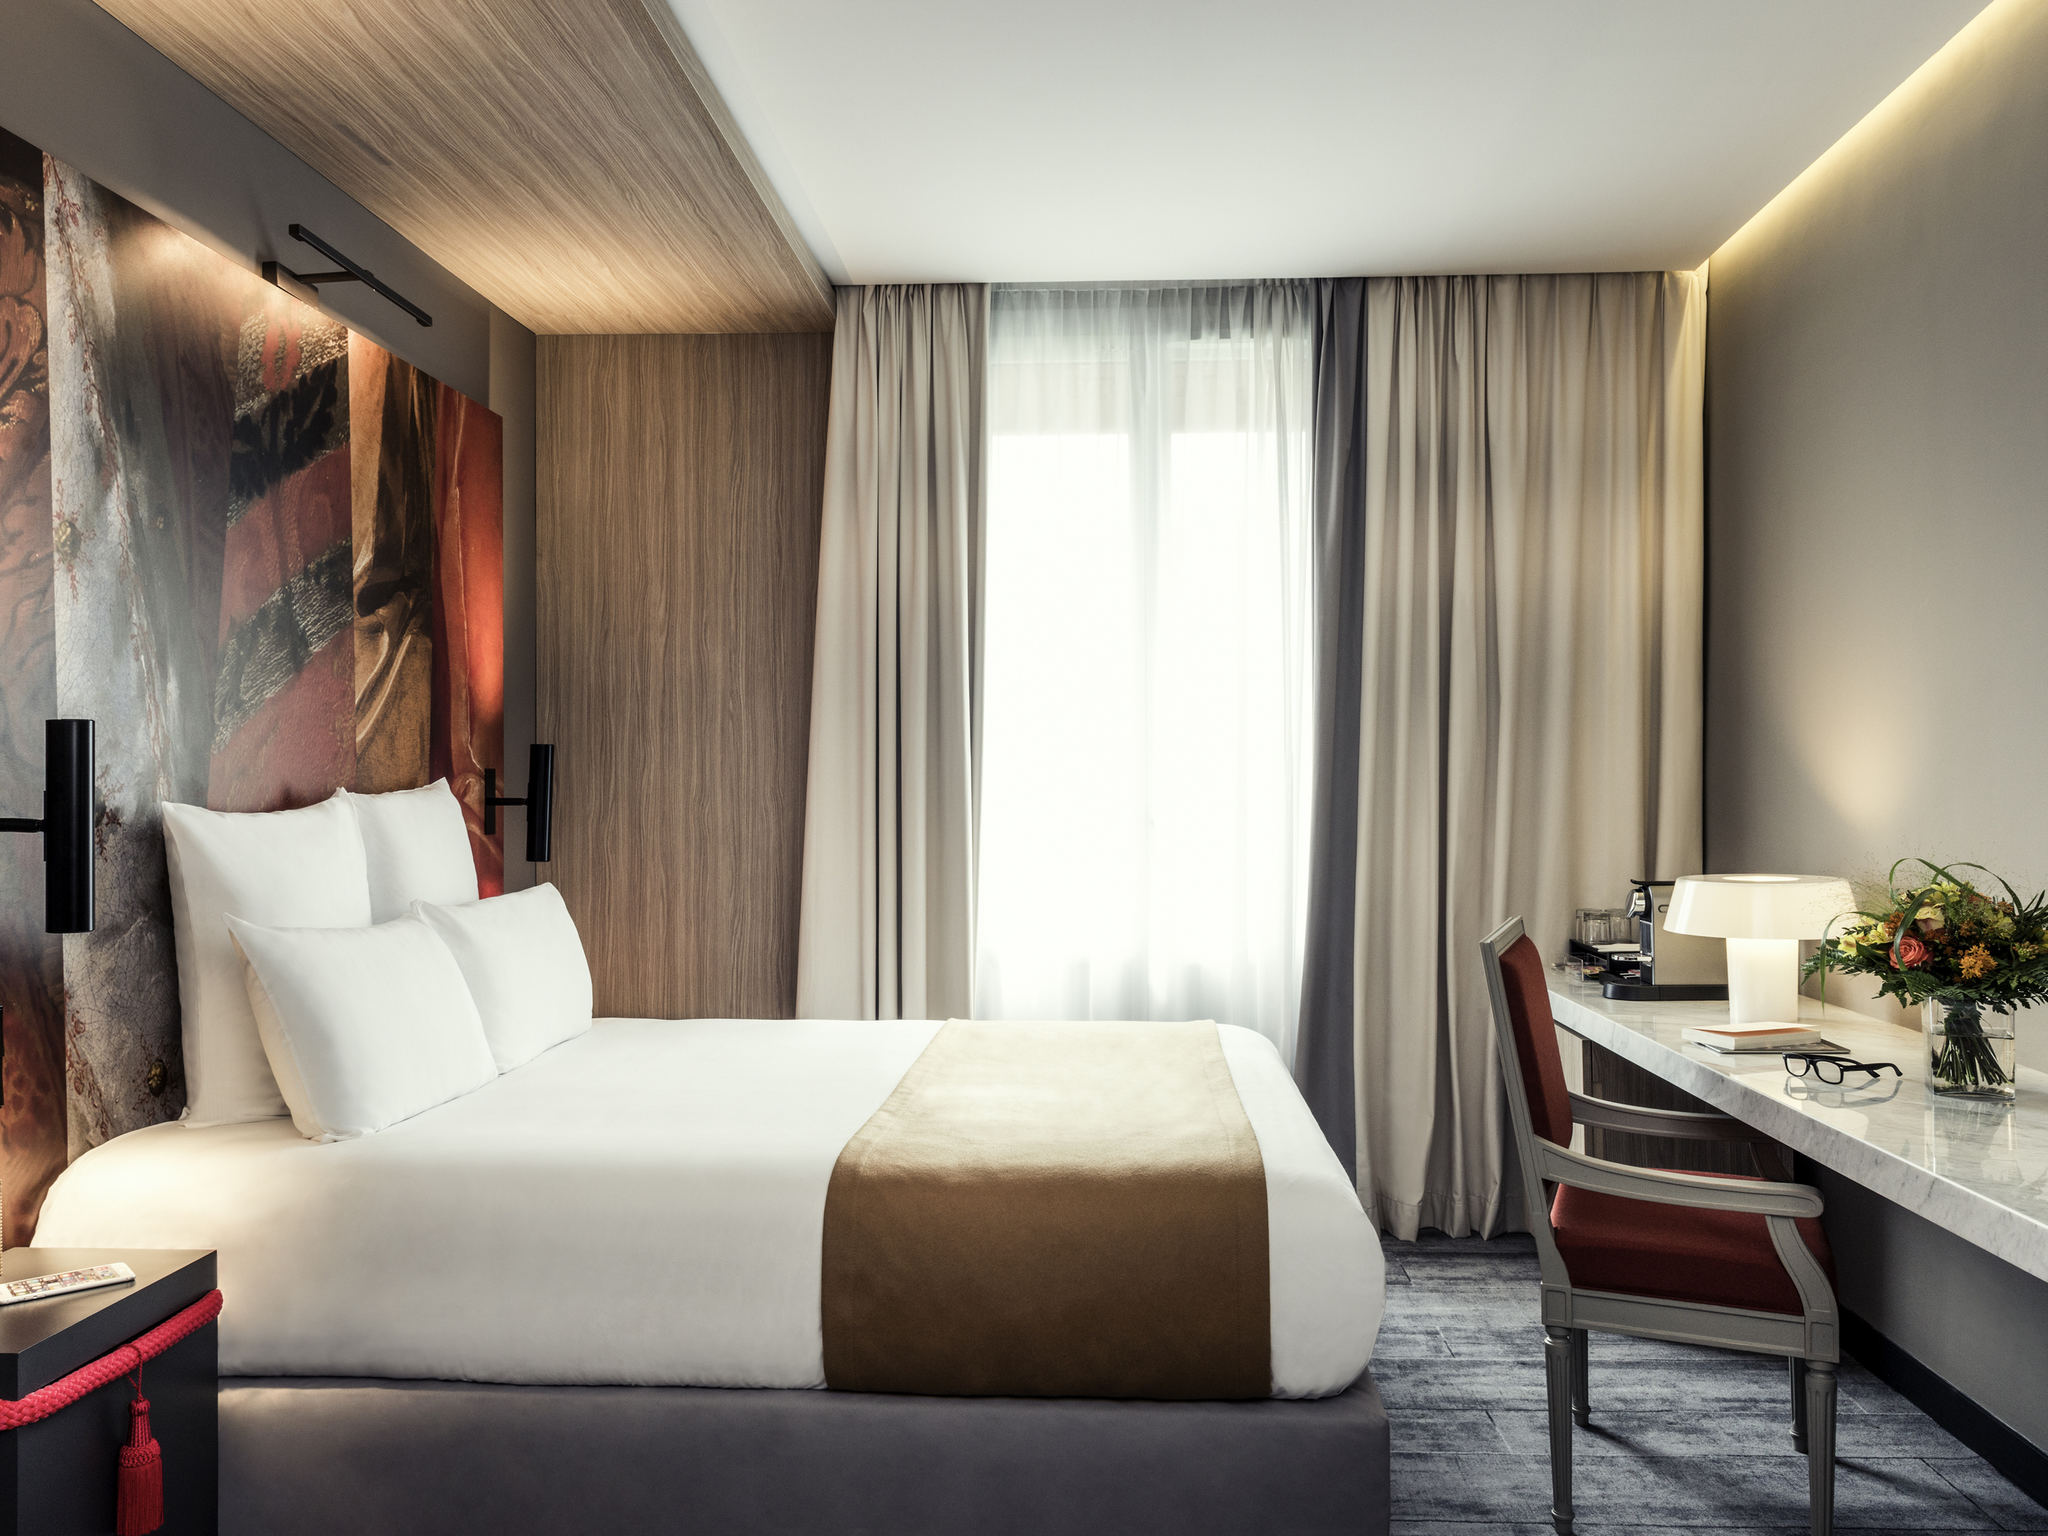 Hotel – Hotel Mercure Paris Alesia